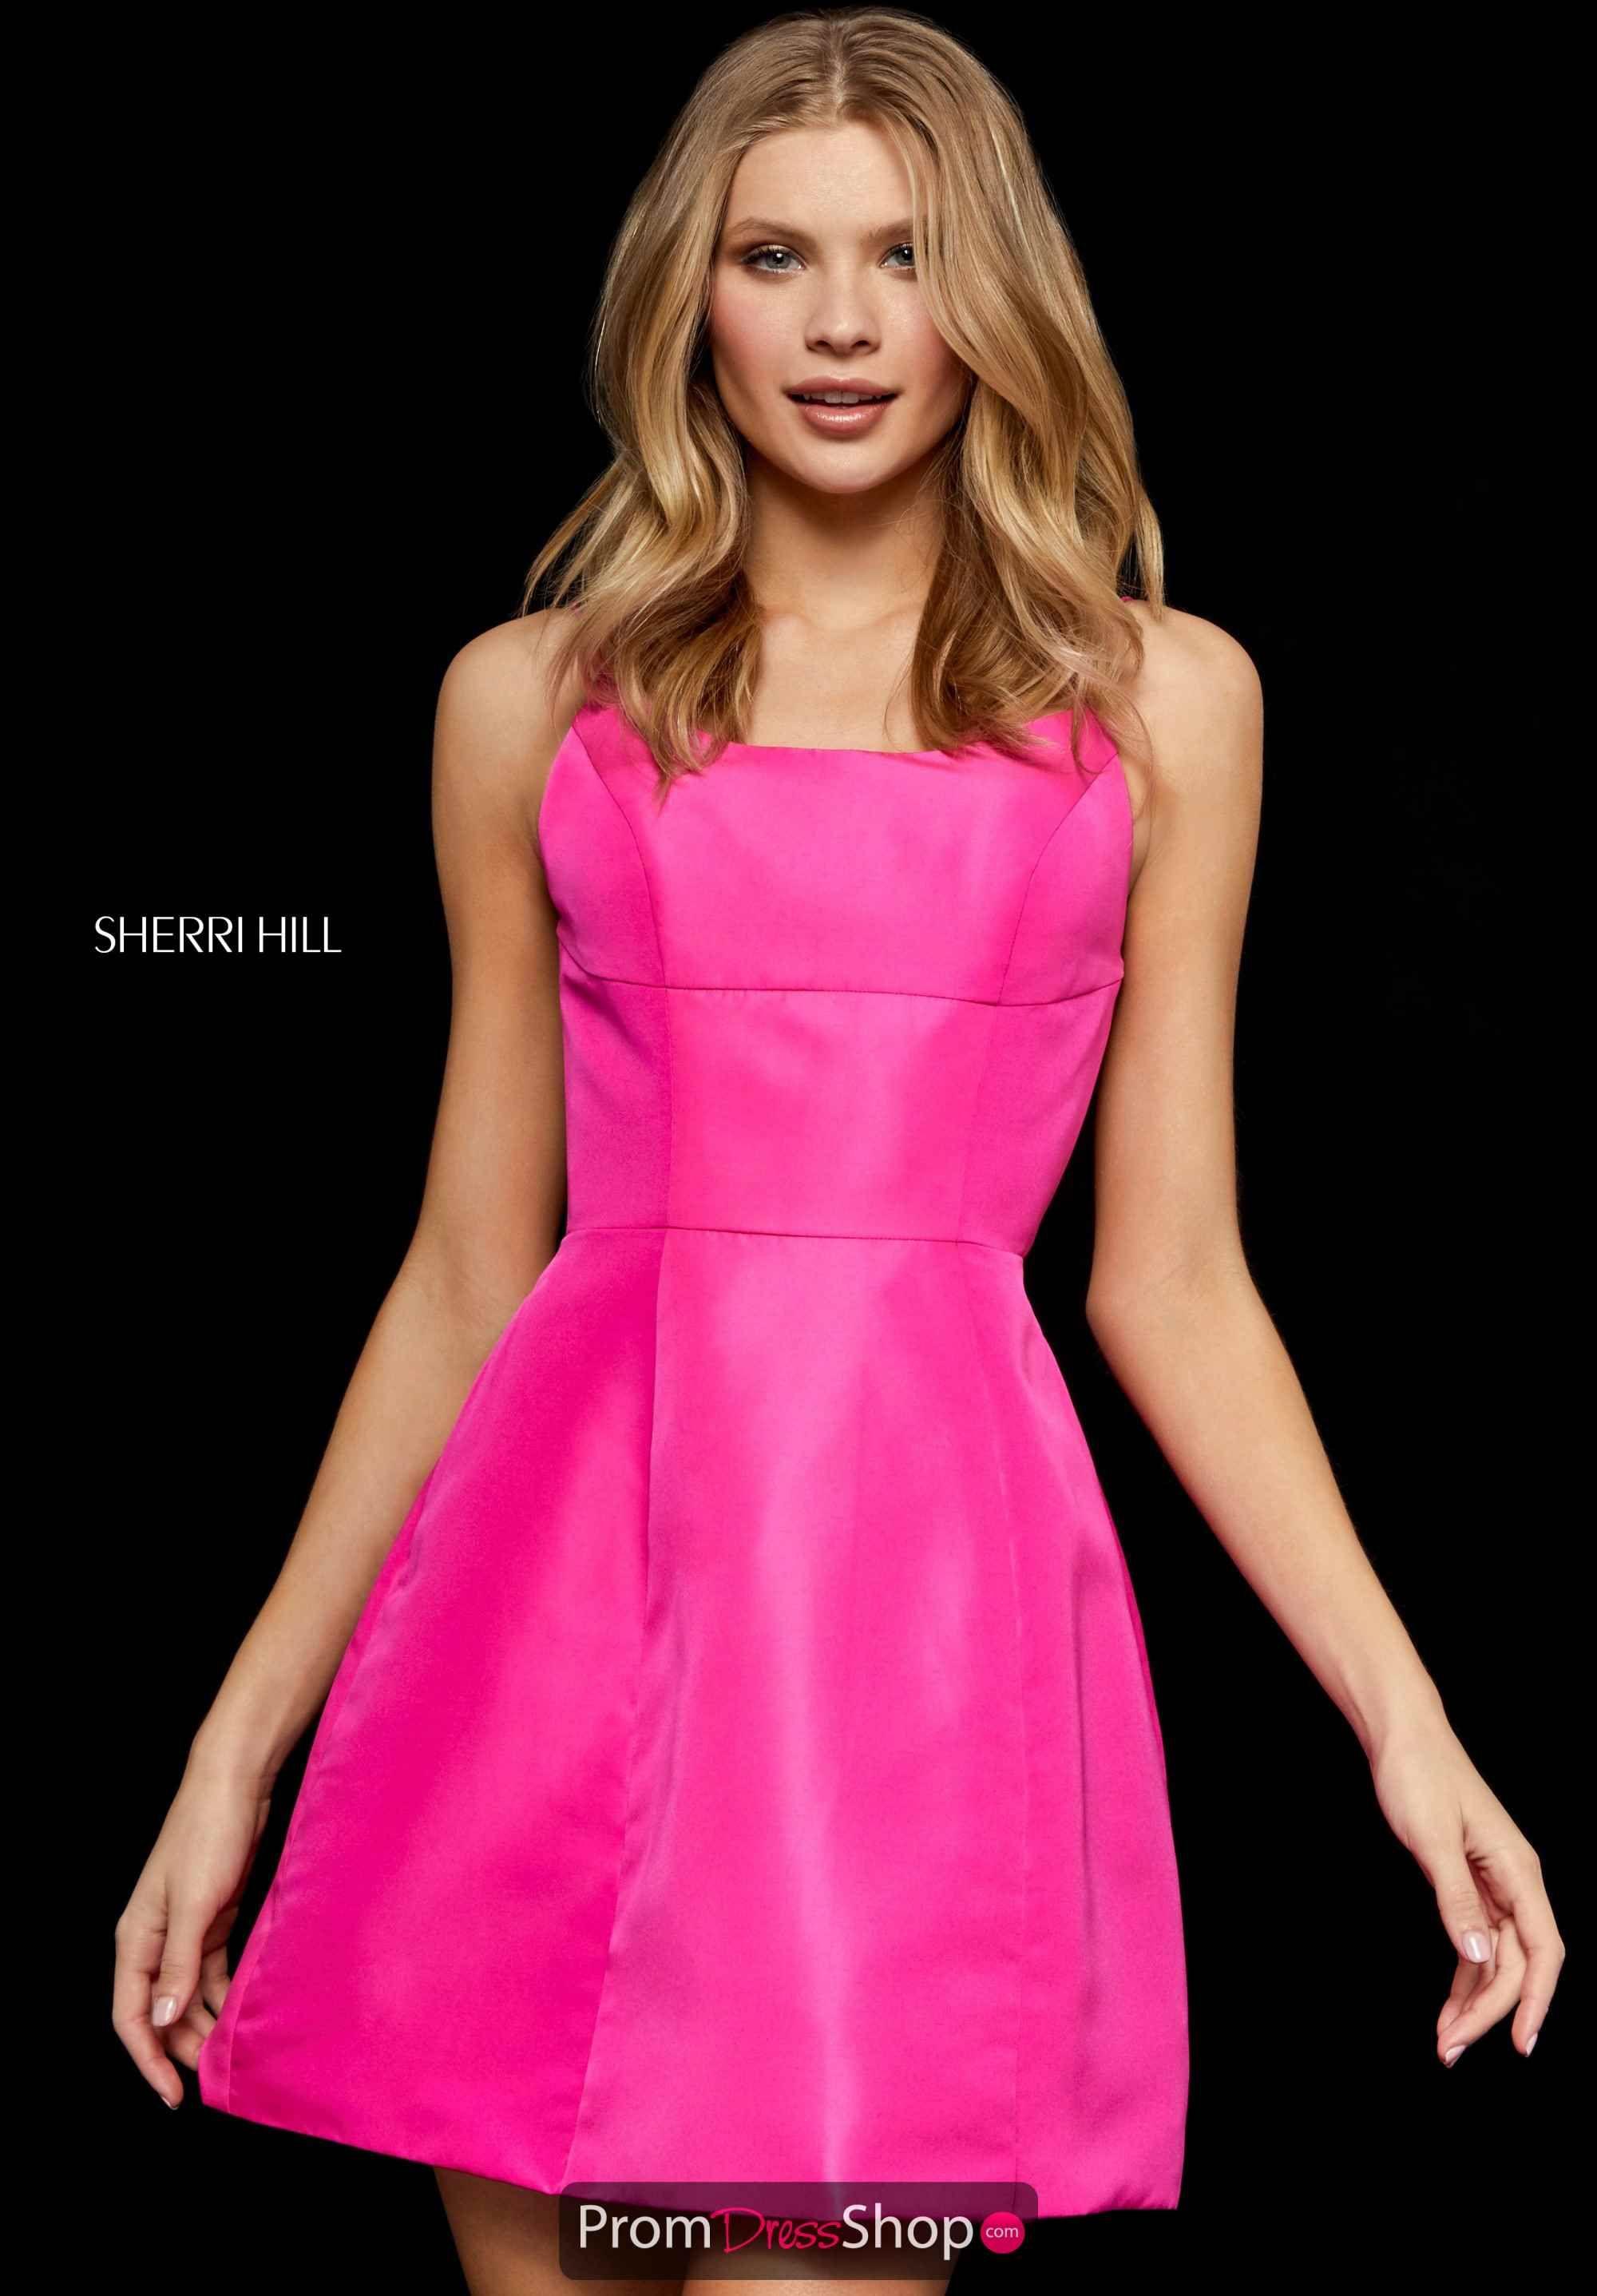 fb3c0cf39a5 Sherri Hill Taffeta Scoop Neckline Short Dress 52154